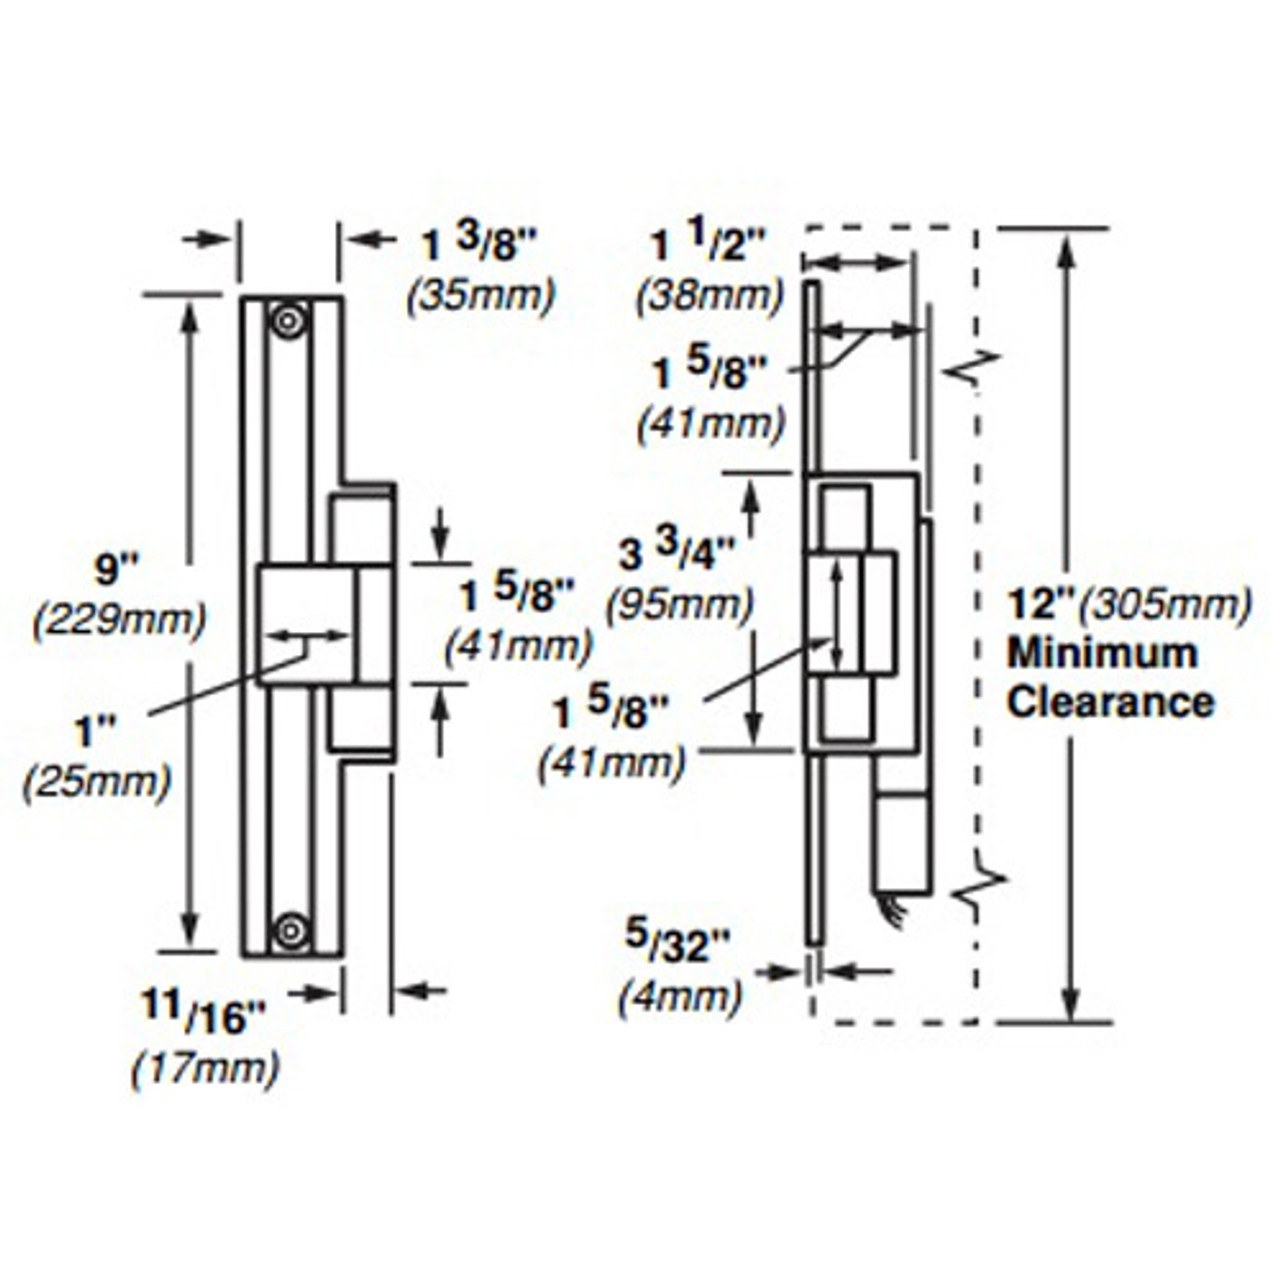 6224AL-DS-12VDC-US10 Von Duprin Electric Strike for Mortise or Cylindrical Locksets in Satin Bronze Finish